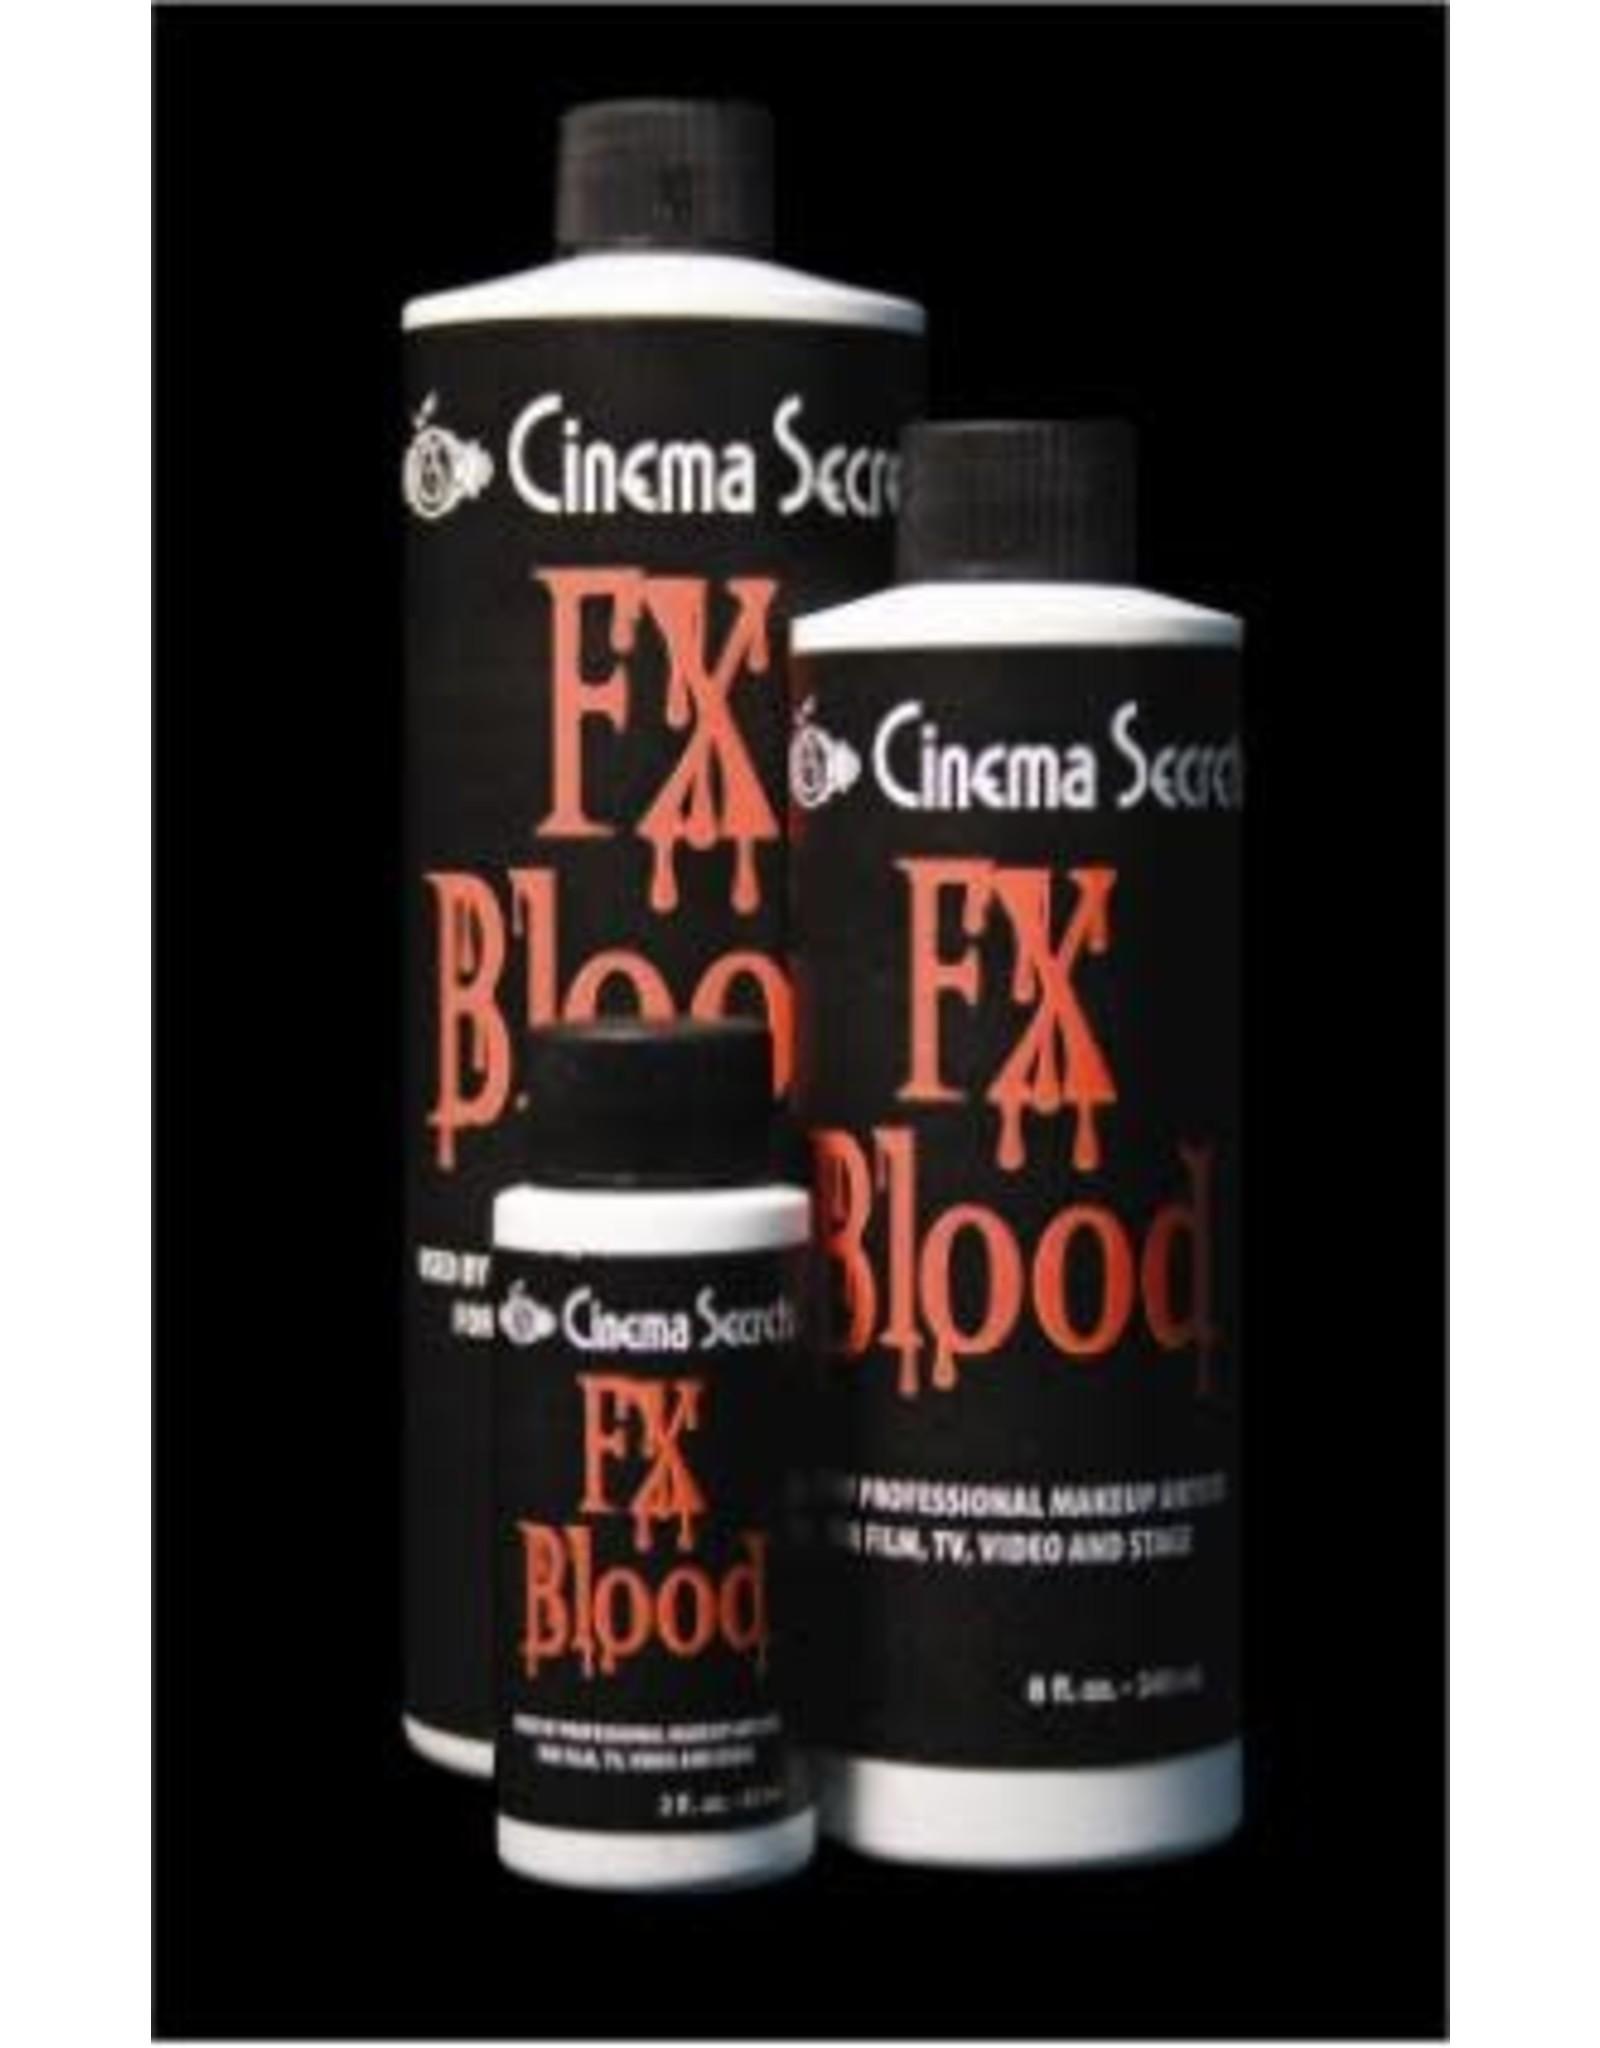 Cinema Secrets FX Blood